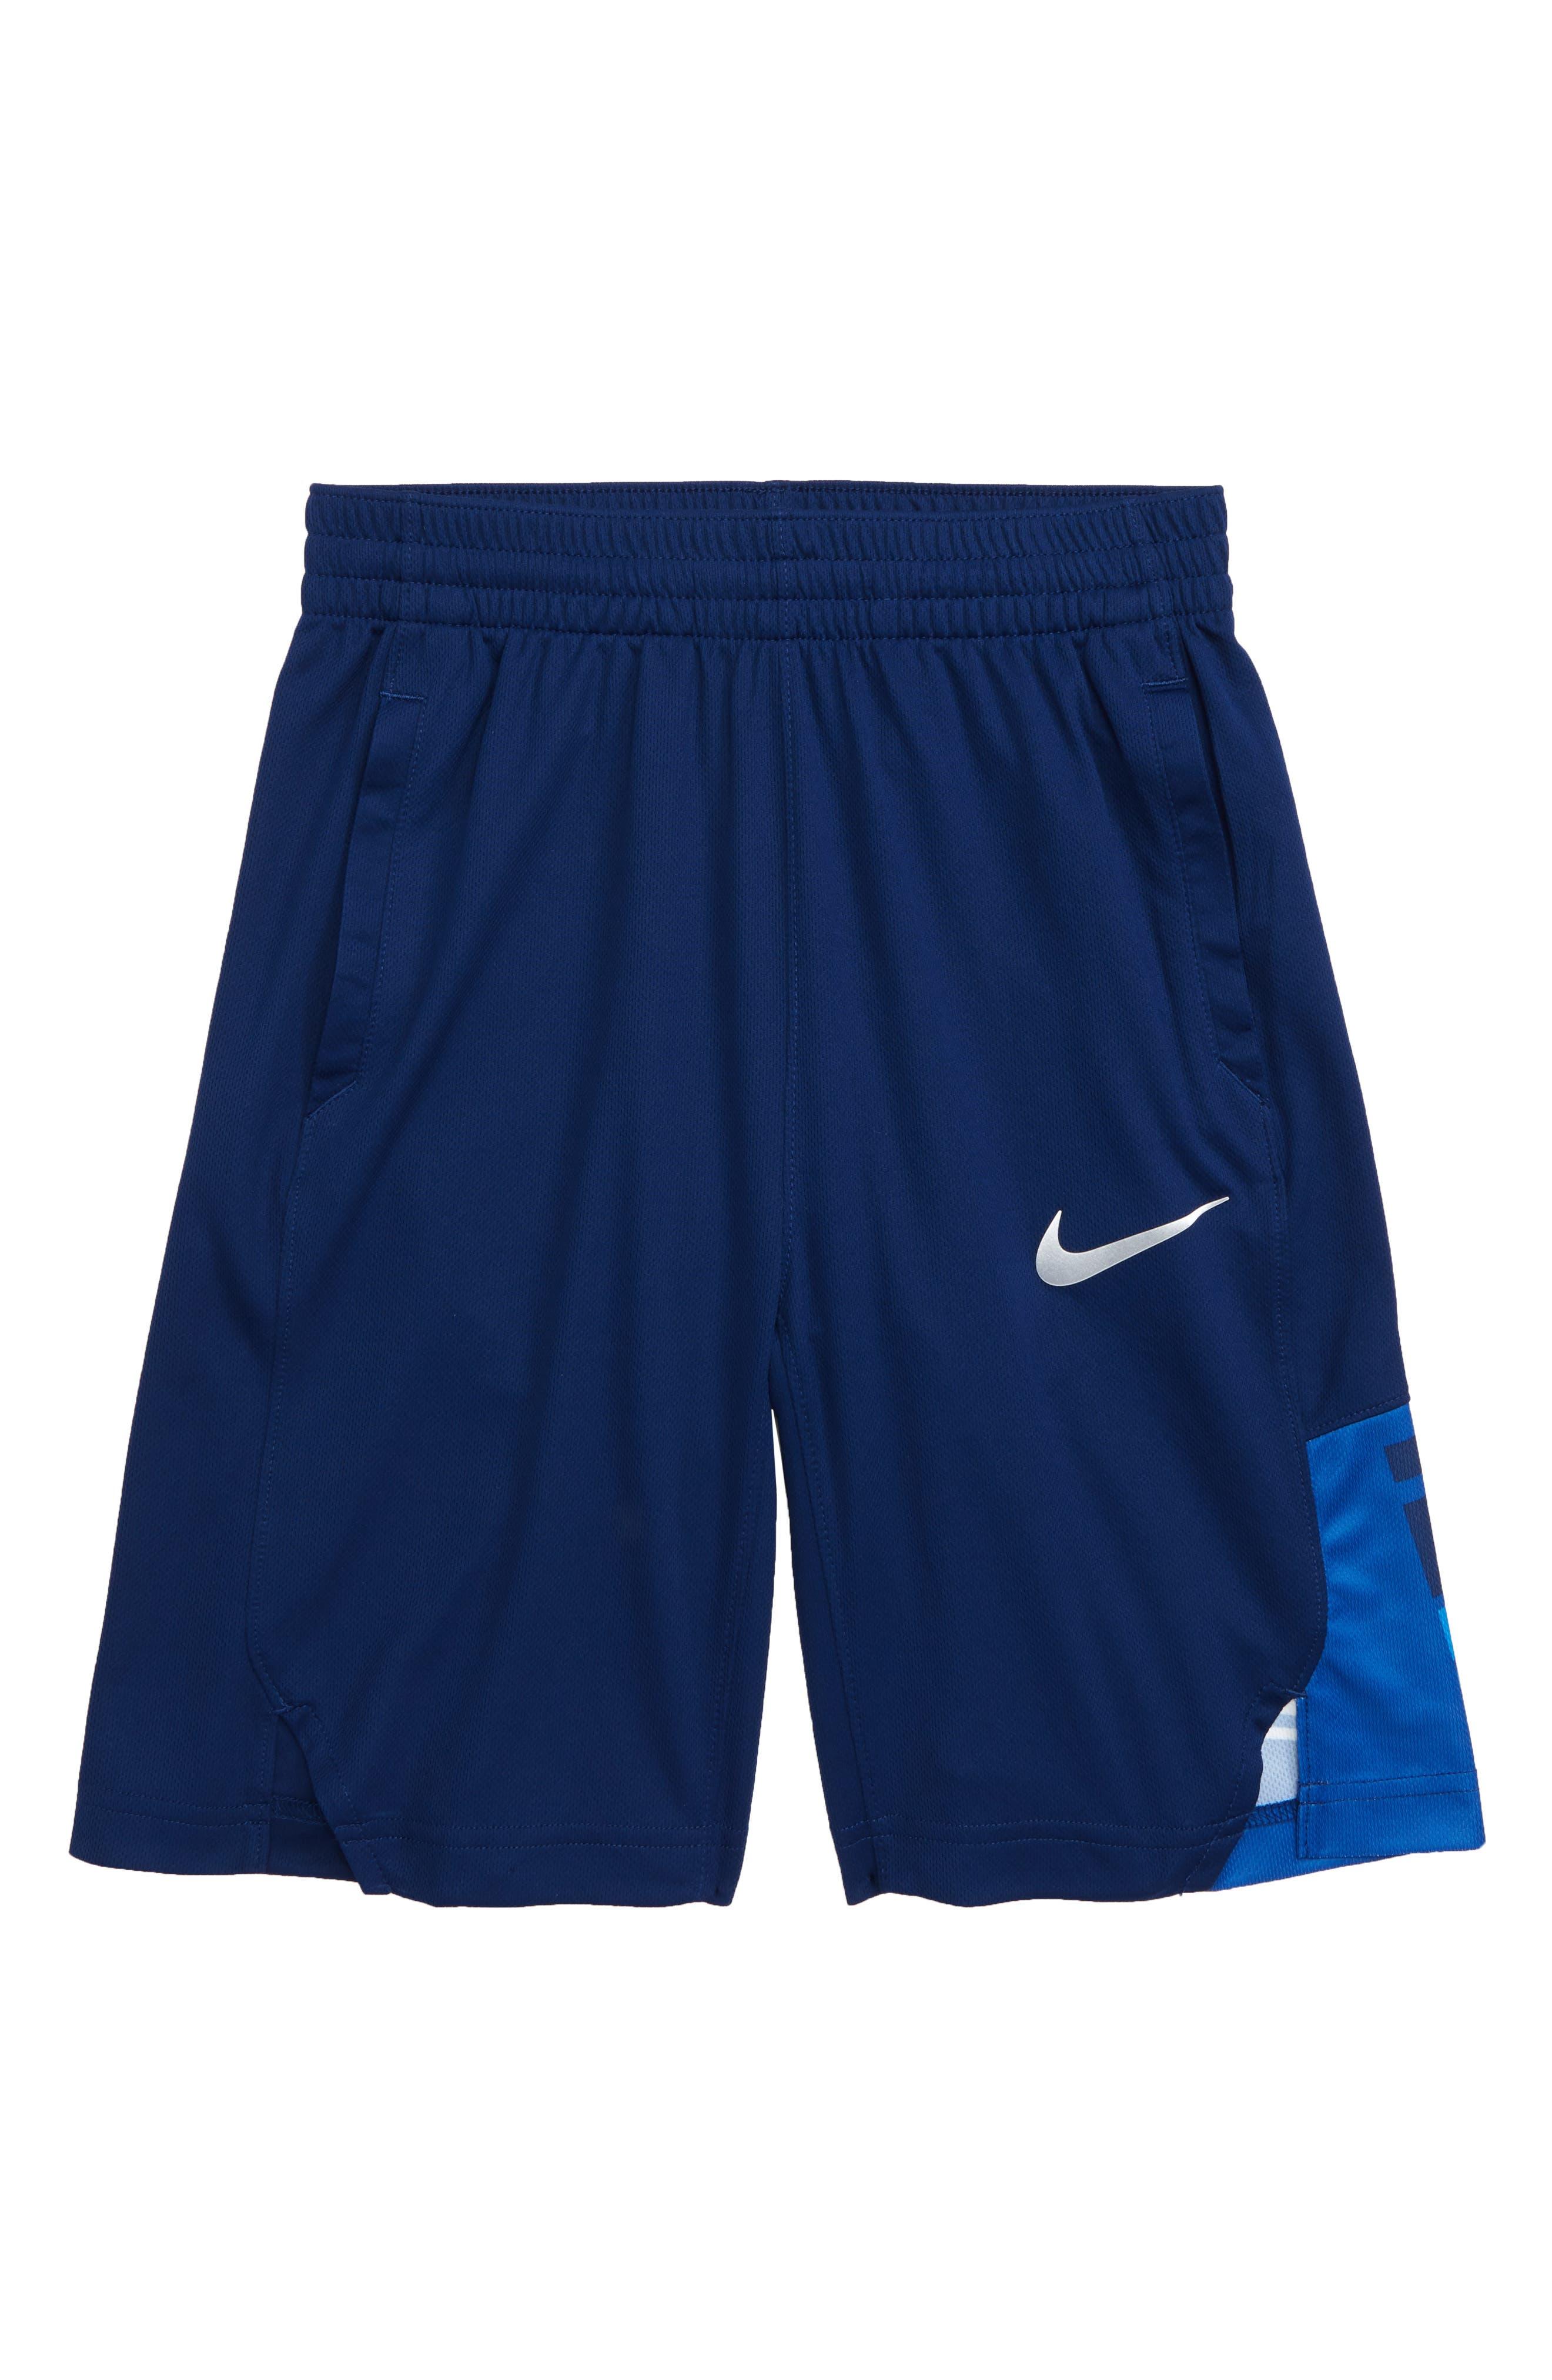 Dry Elite Athletic Shorts,                             Main thumbnail 1, color,                             BLUE VOID/ WHITE